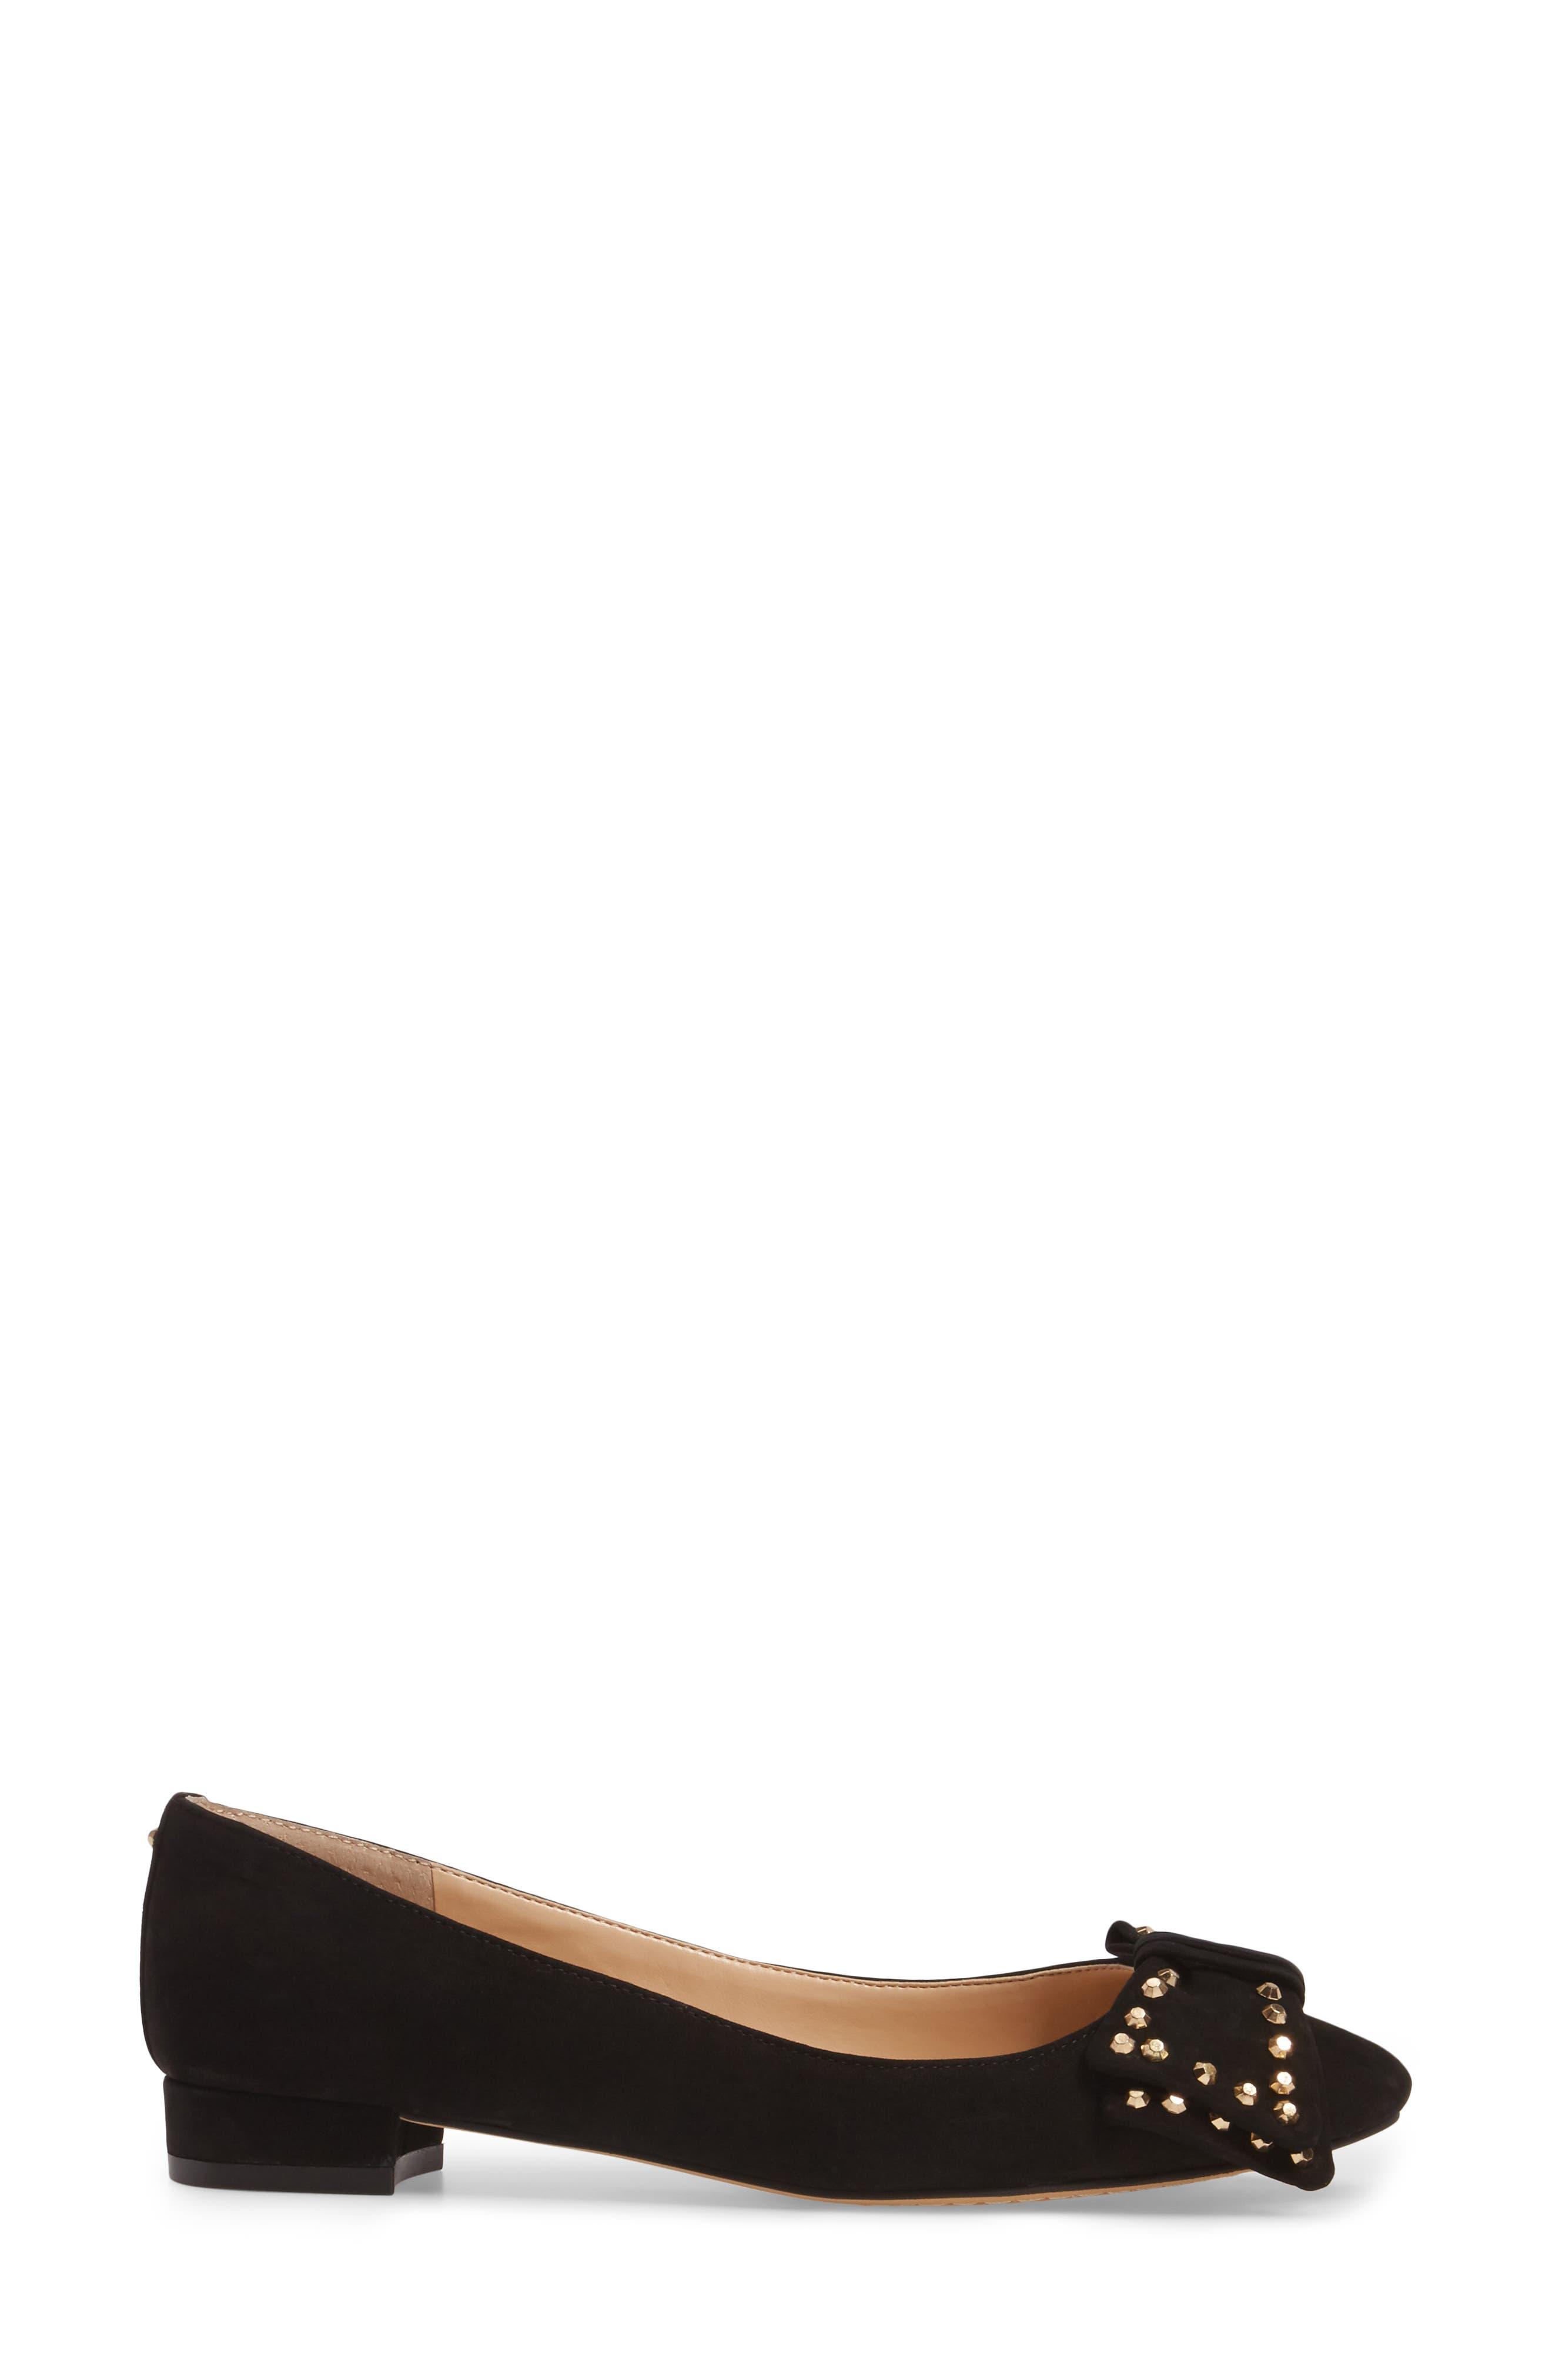 Annaley Flat,                             Alternate thumbnail 3, color,                             Black Nubuck Leather